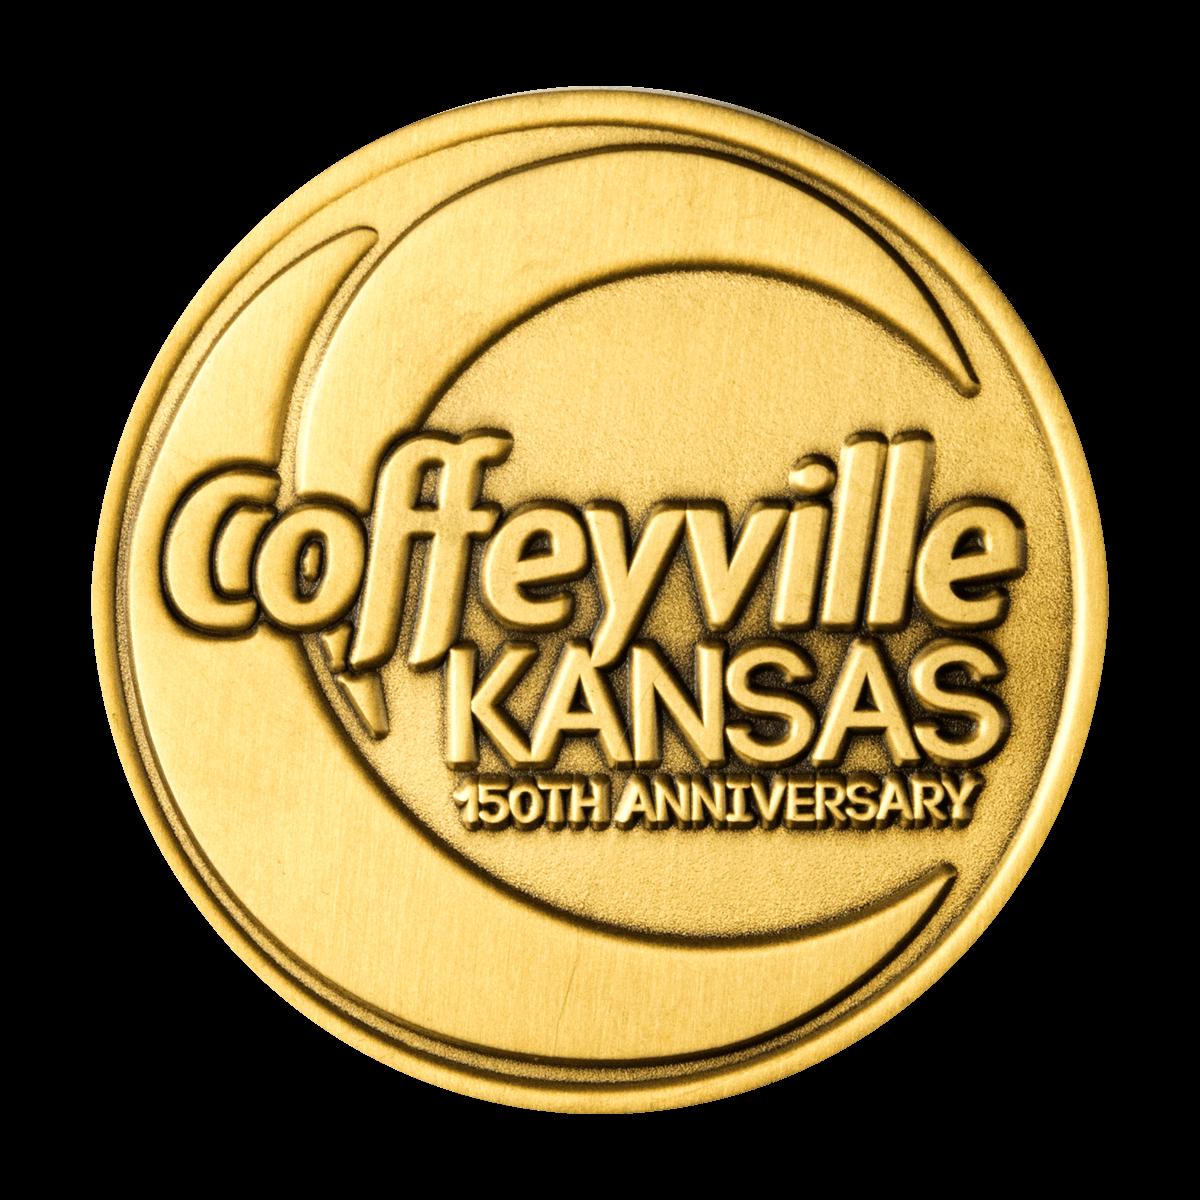 City of Coffeyville Kansas 150th Anniversary Coin